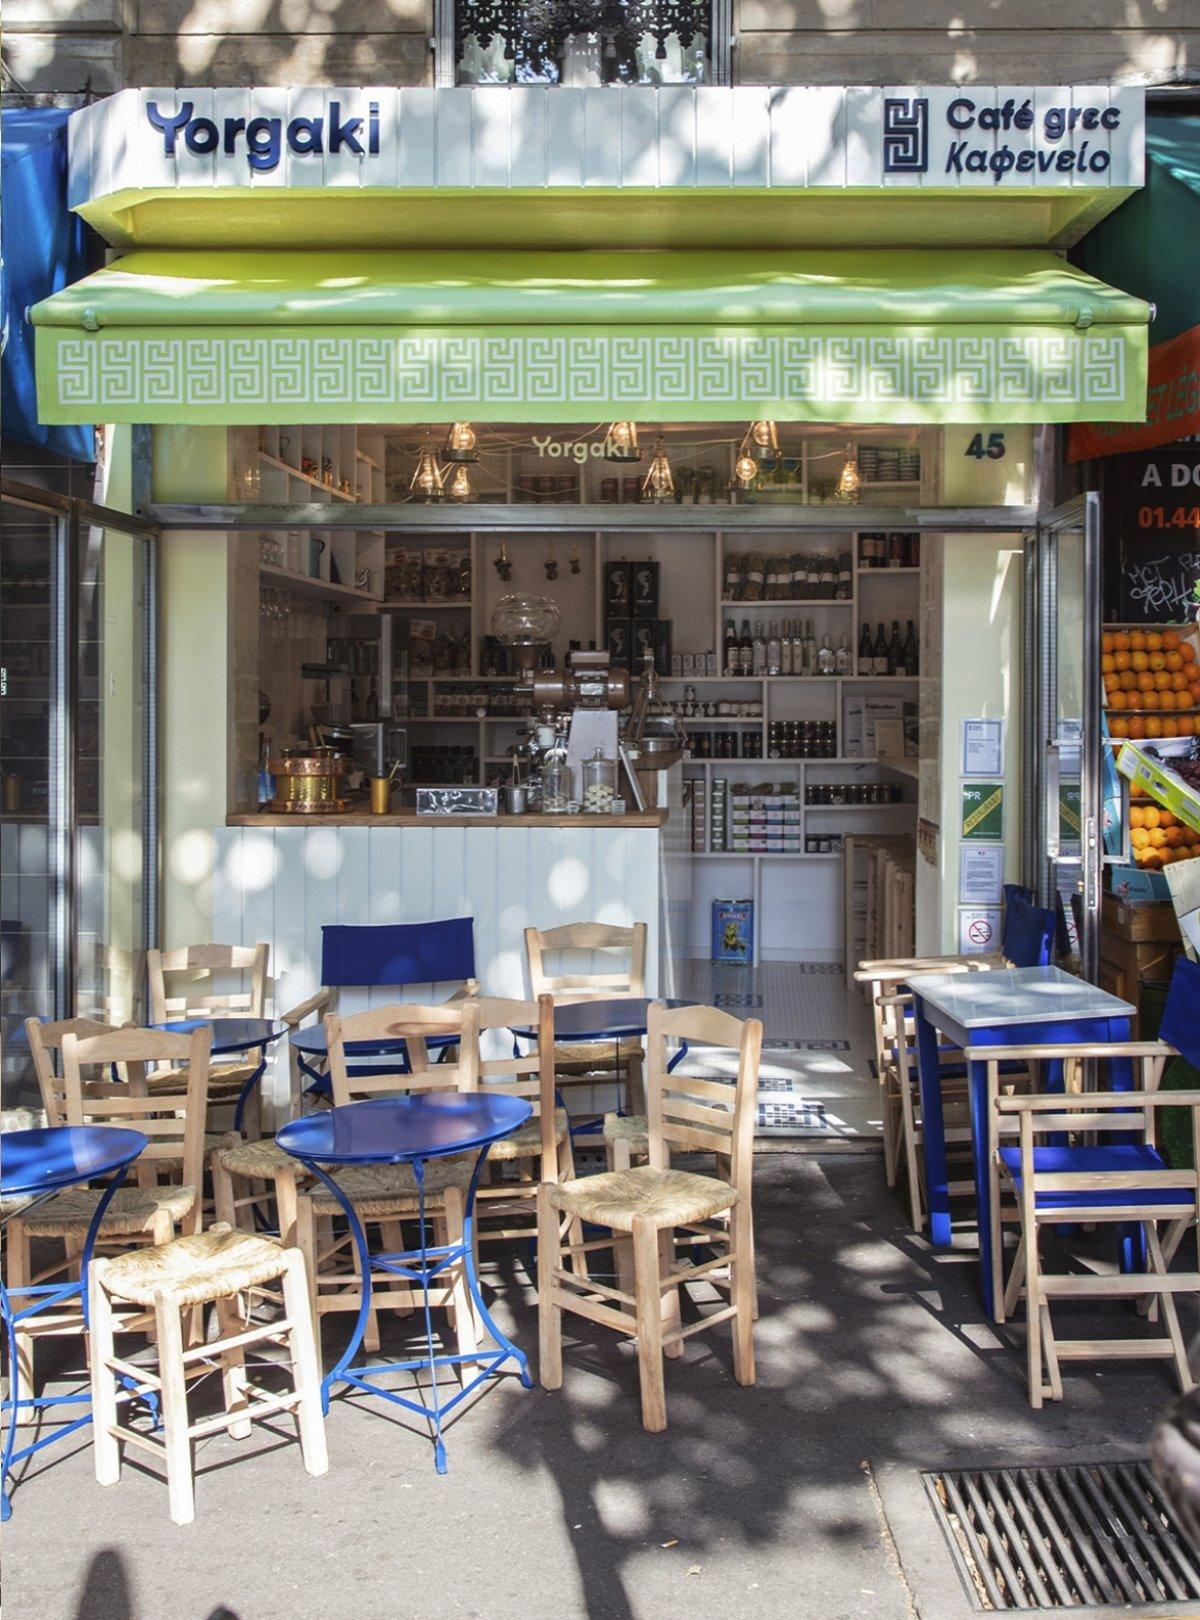 Yorgaki καφέ στο παρίσι παραδοσιακός καφές εξωτερικός χώρος